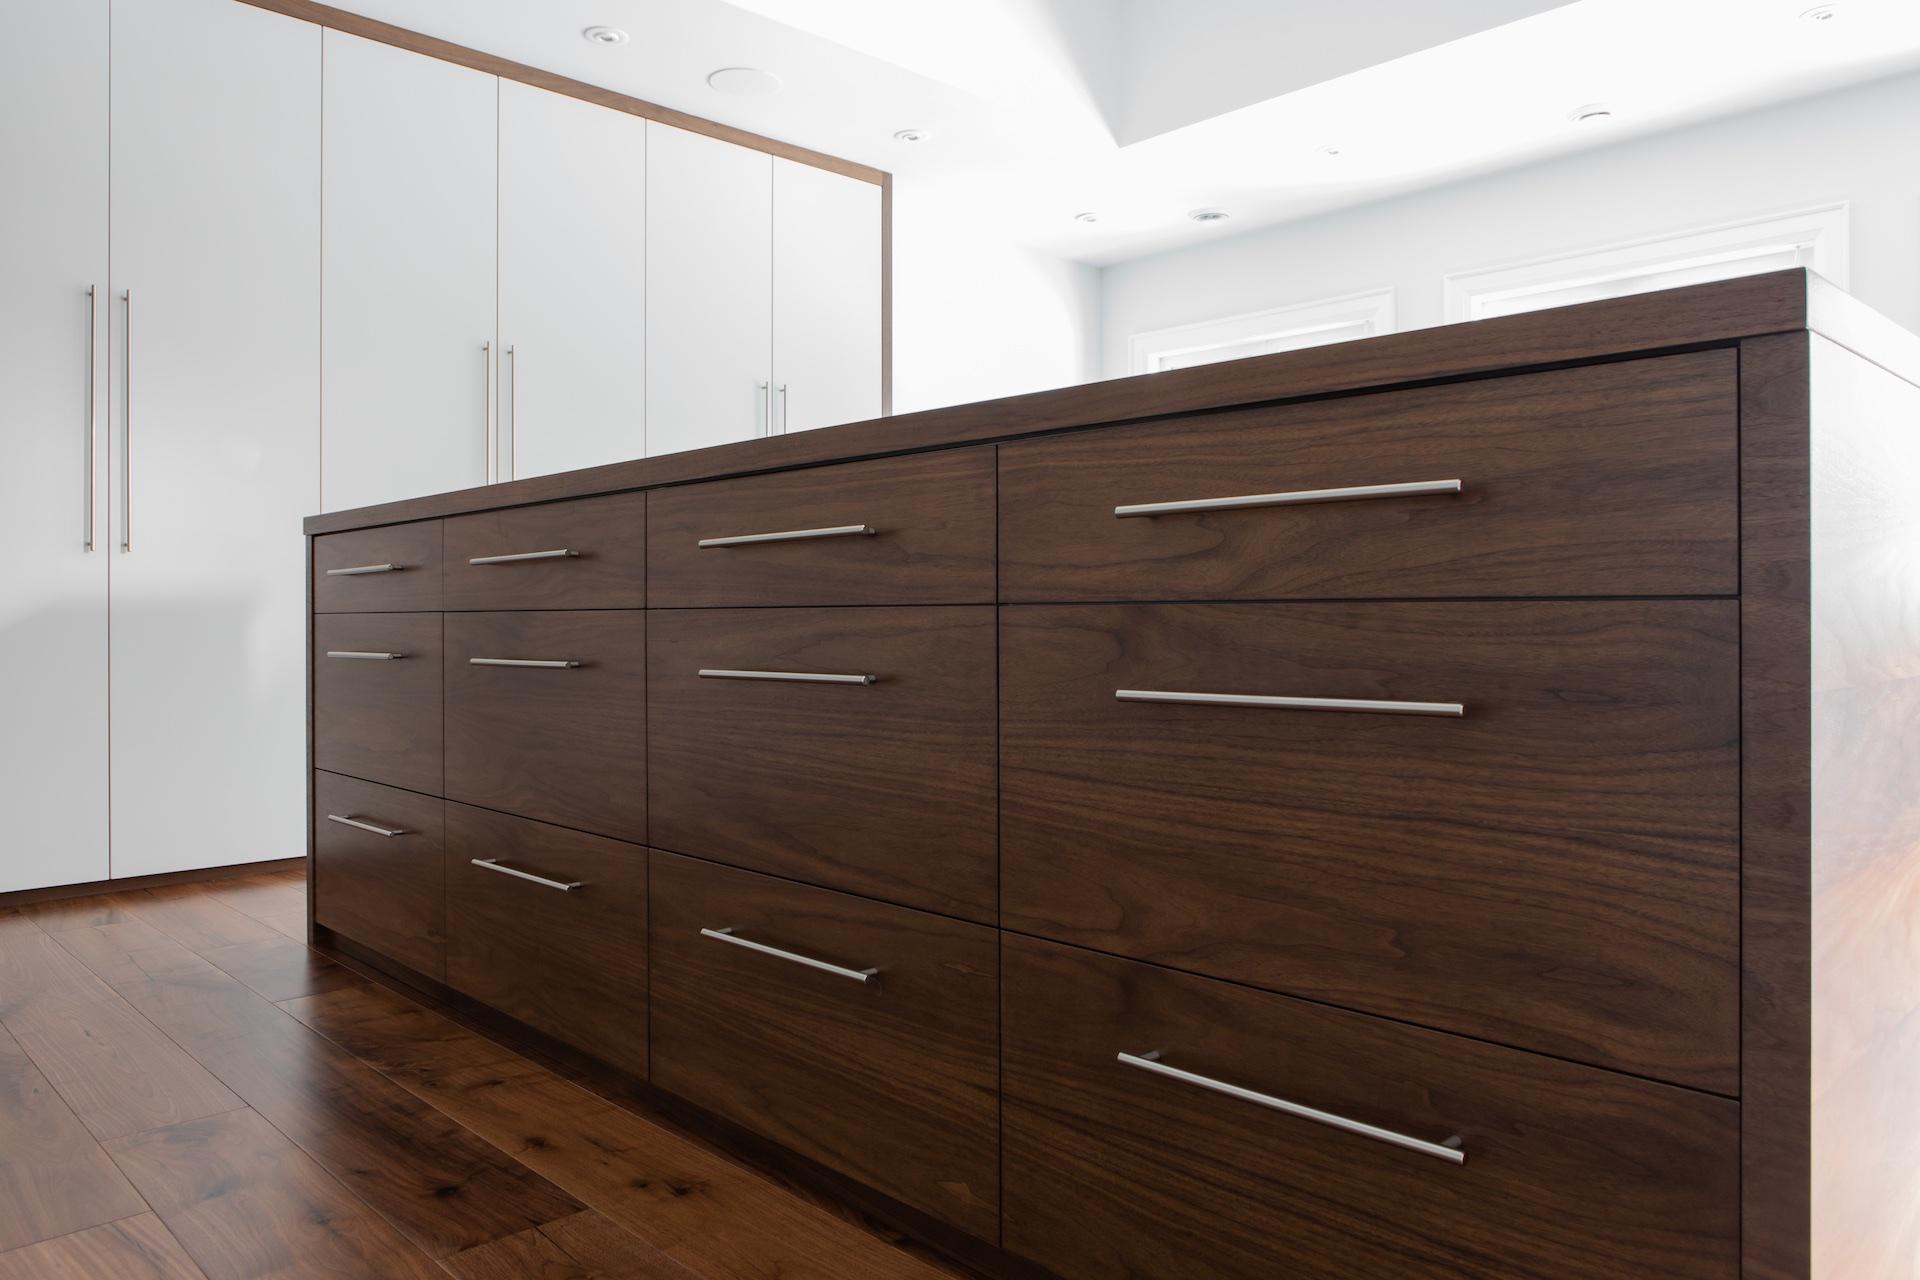 Wood drawers